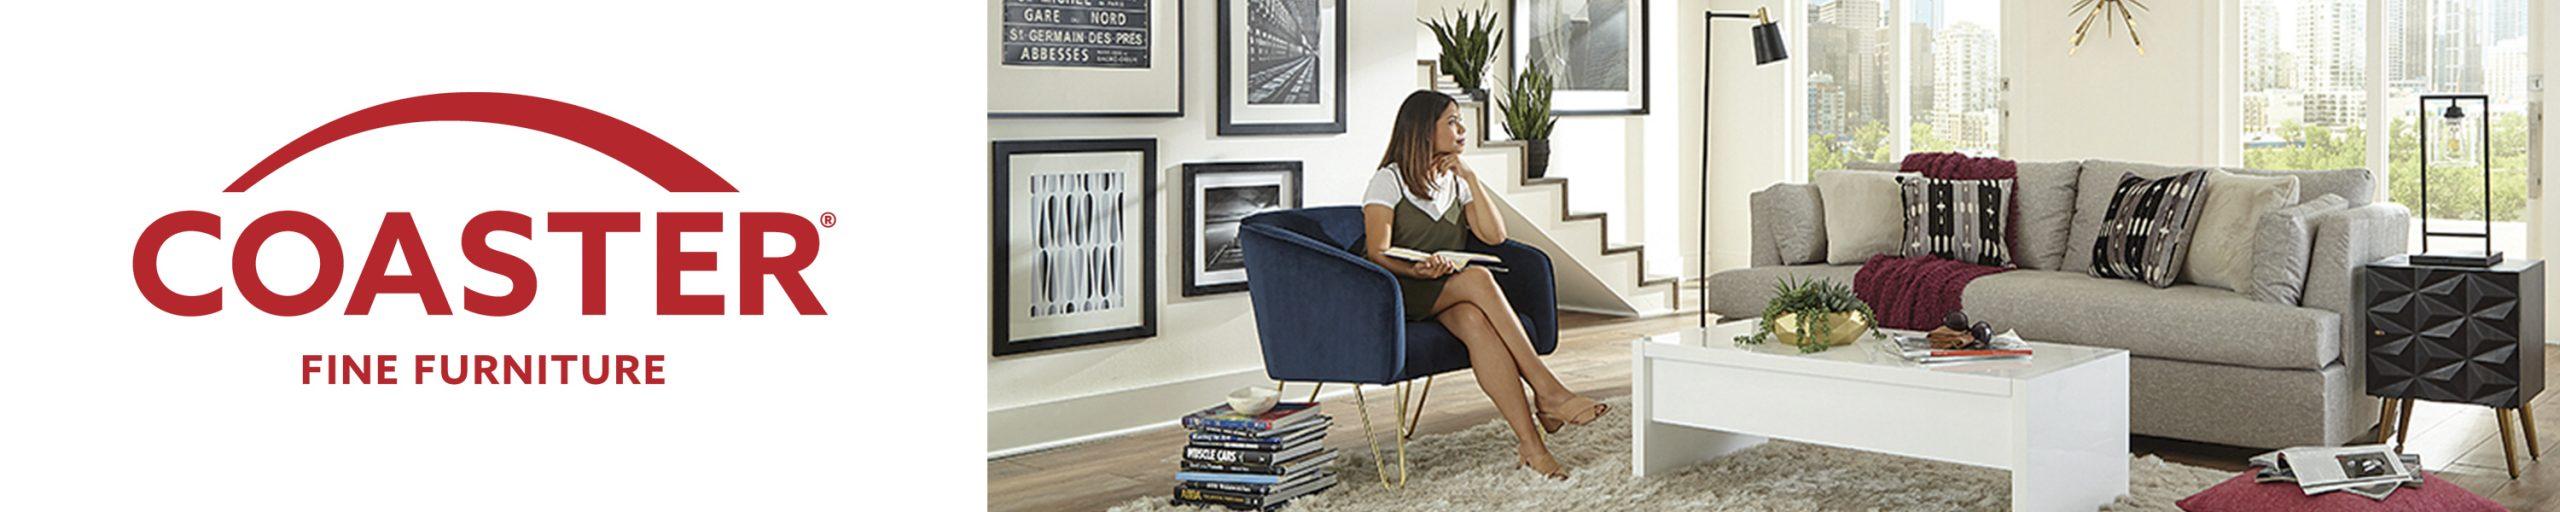 My Coaster Furniture Reviews